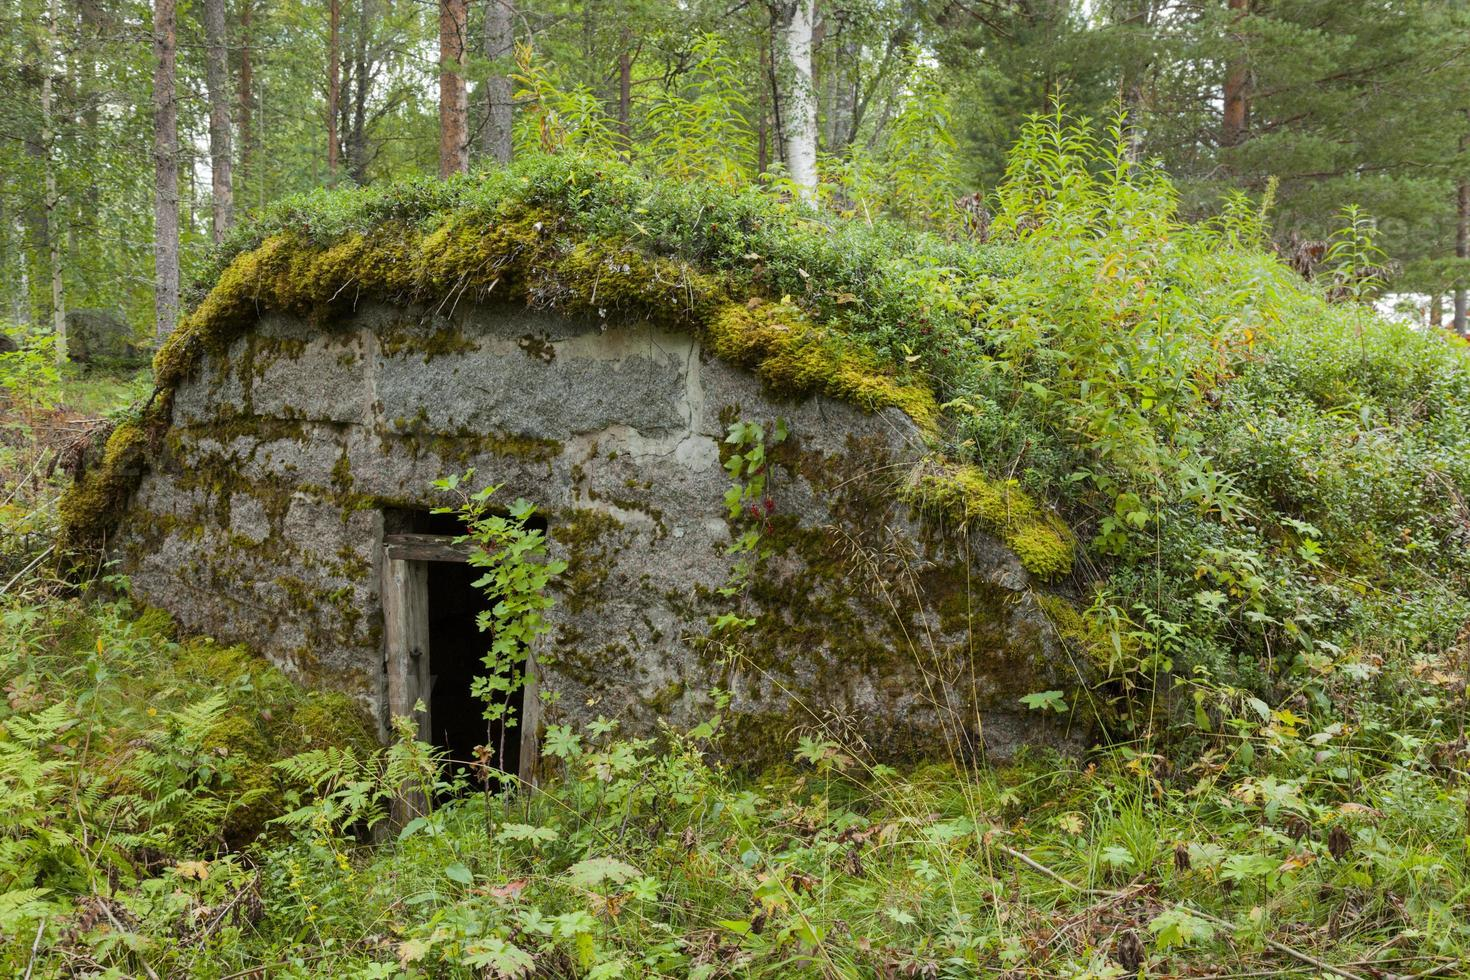 erdkeller - gammal bevuxen källare foto